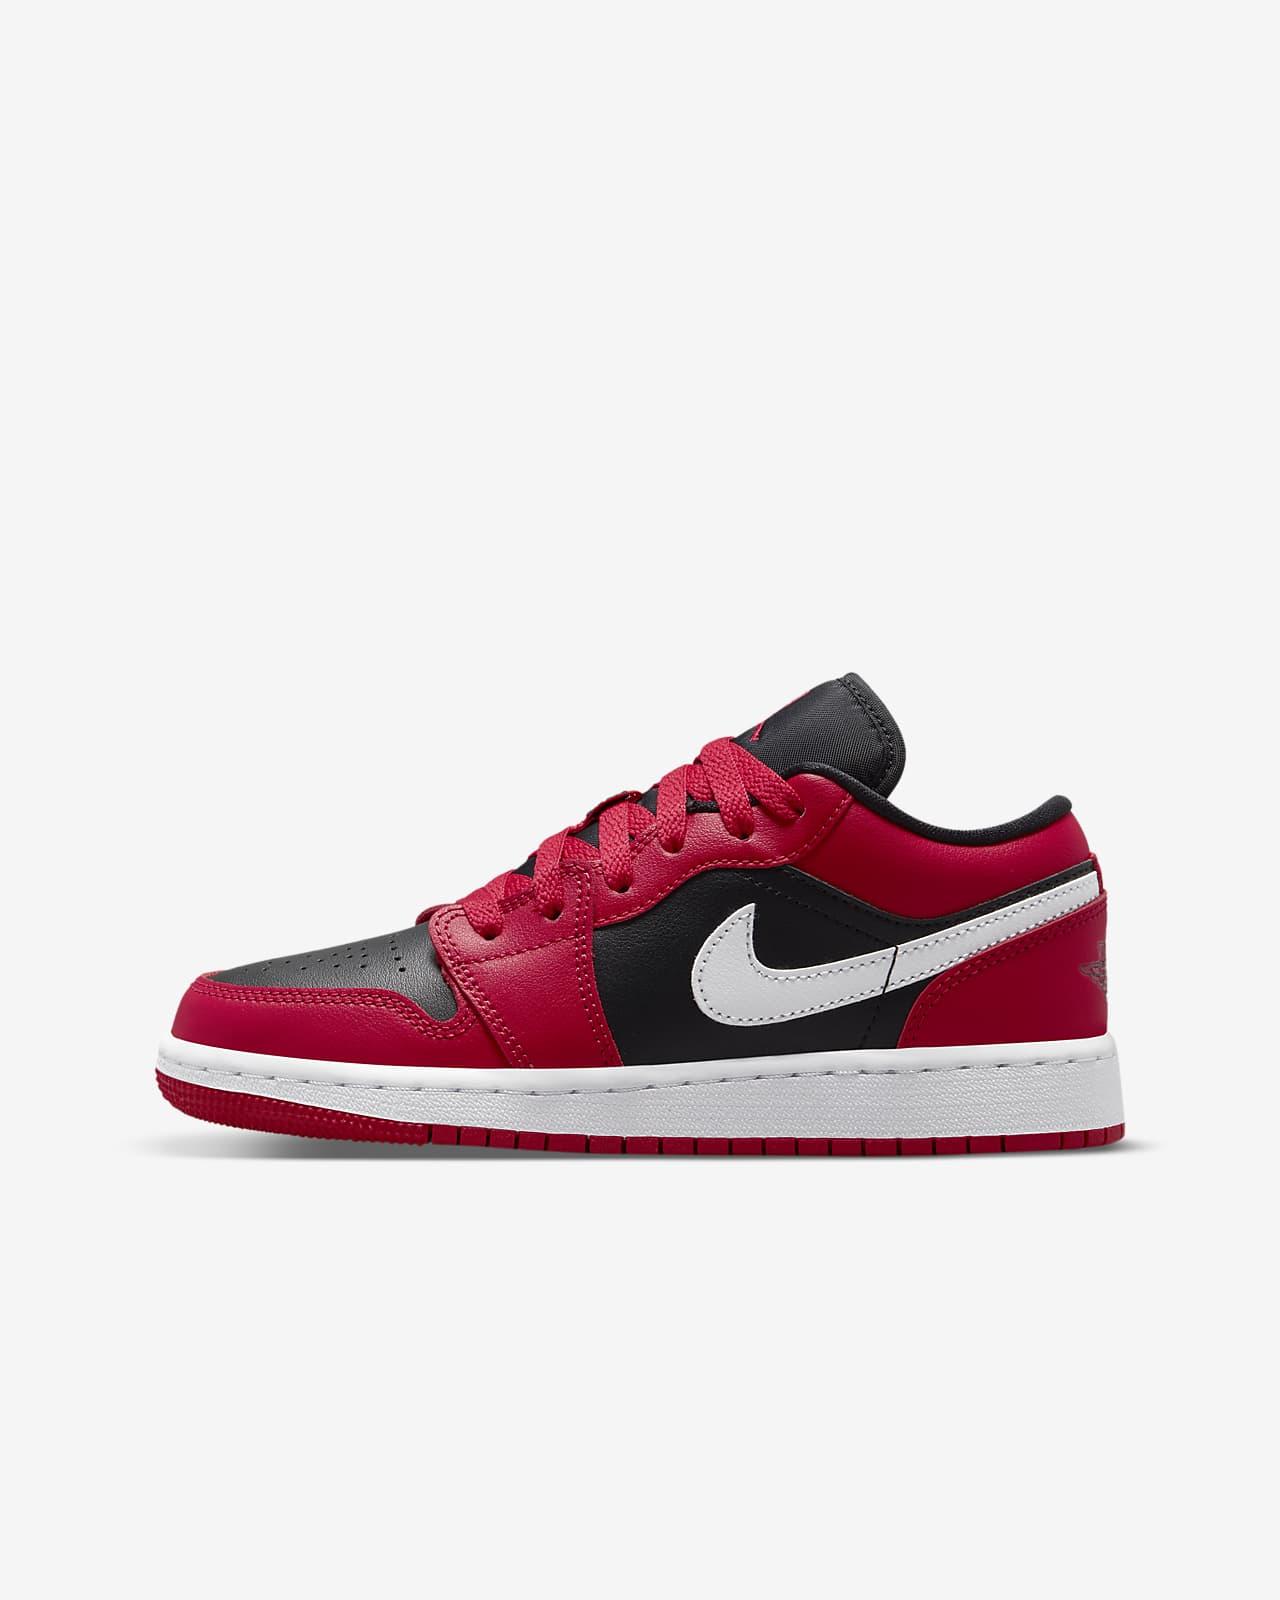 Air Jordan 1 Low Older Kids' Shoe. Nike LU